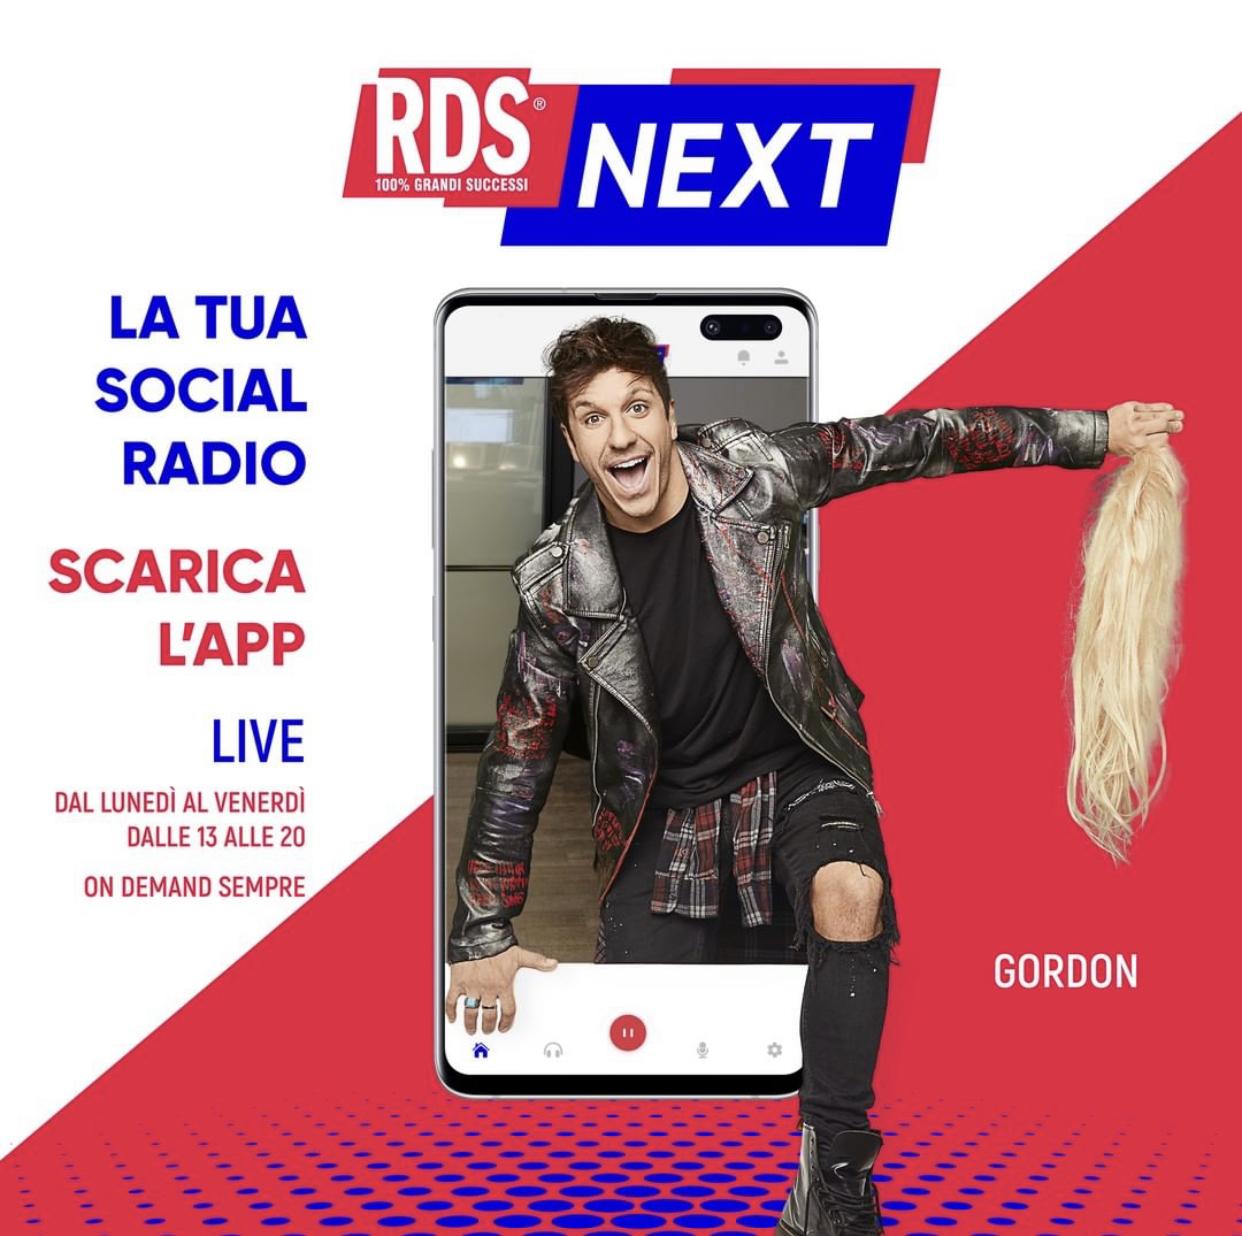 RDS NEXT - GORDON